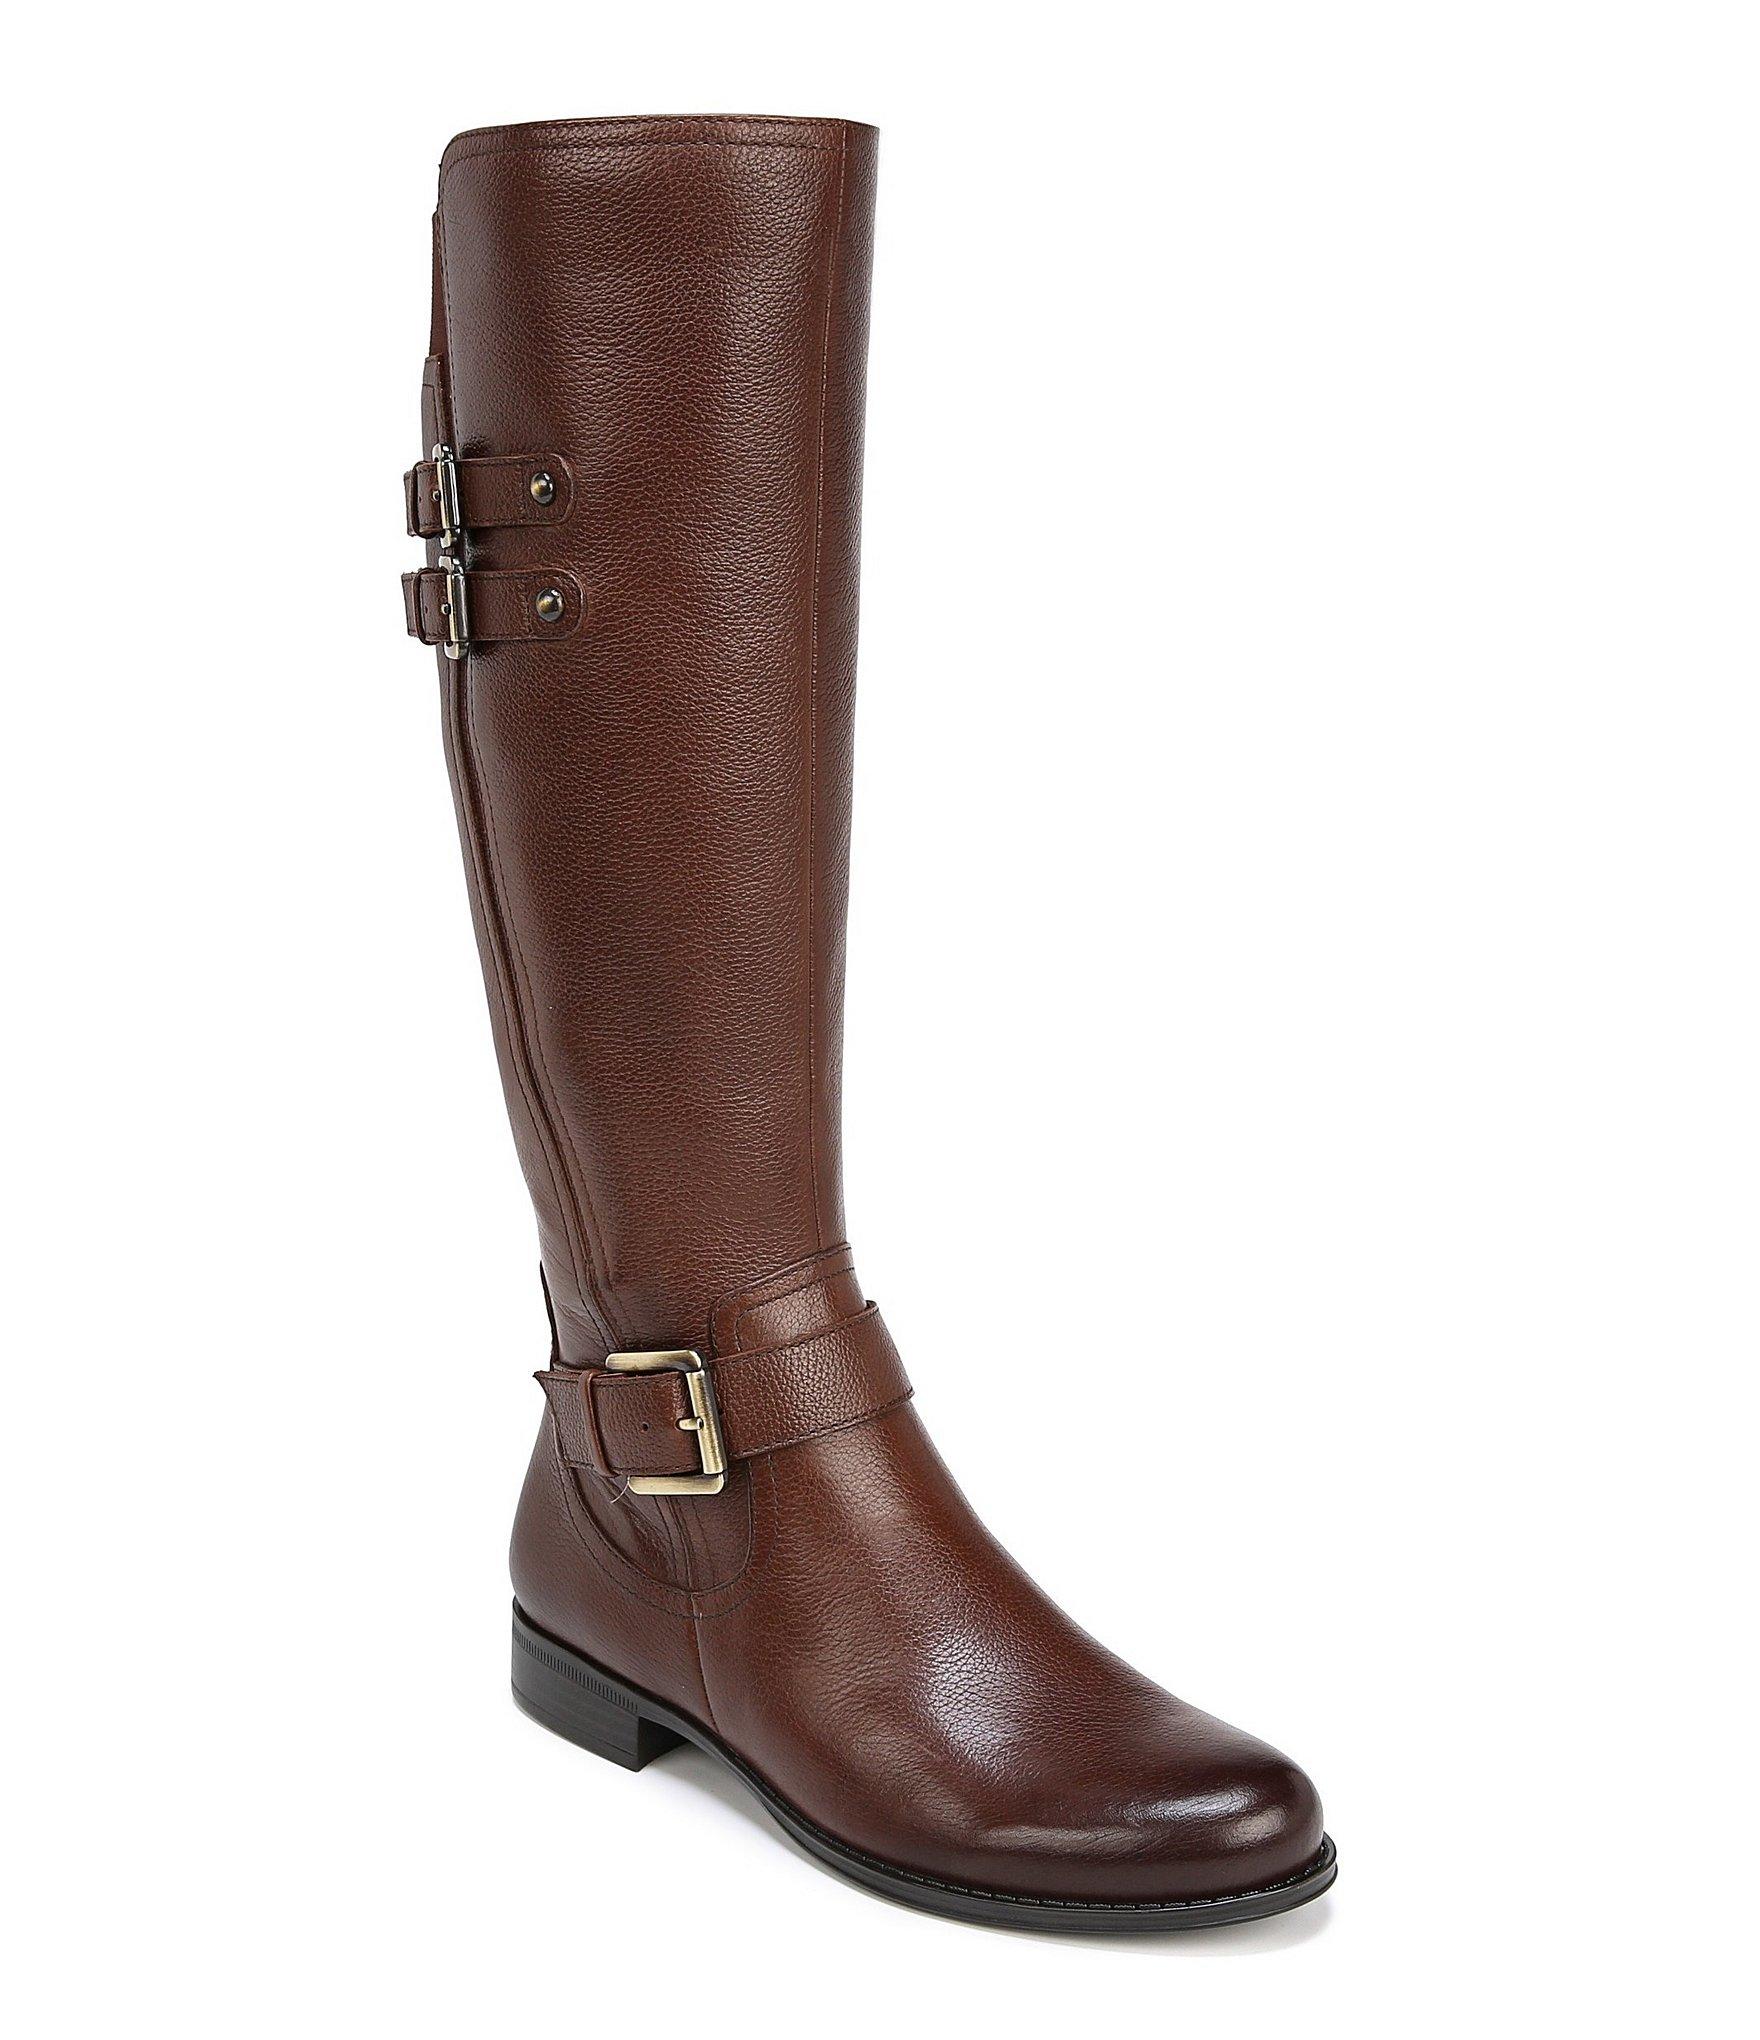 Clearance Women's Wide Calf Boots